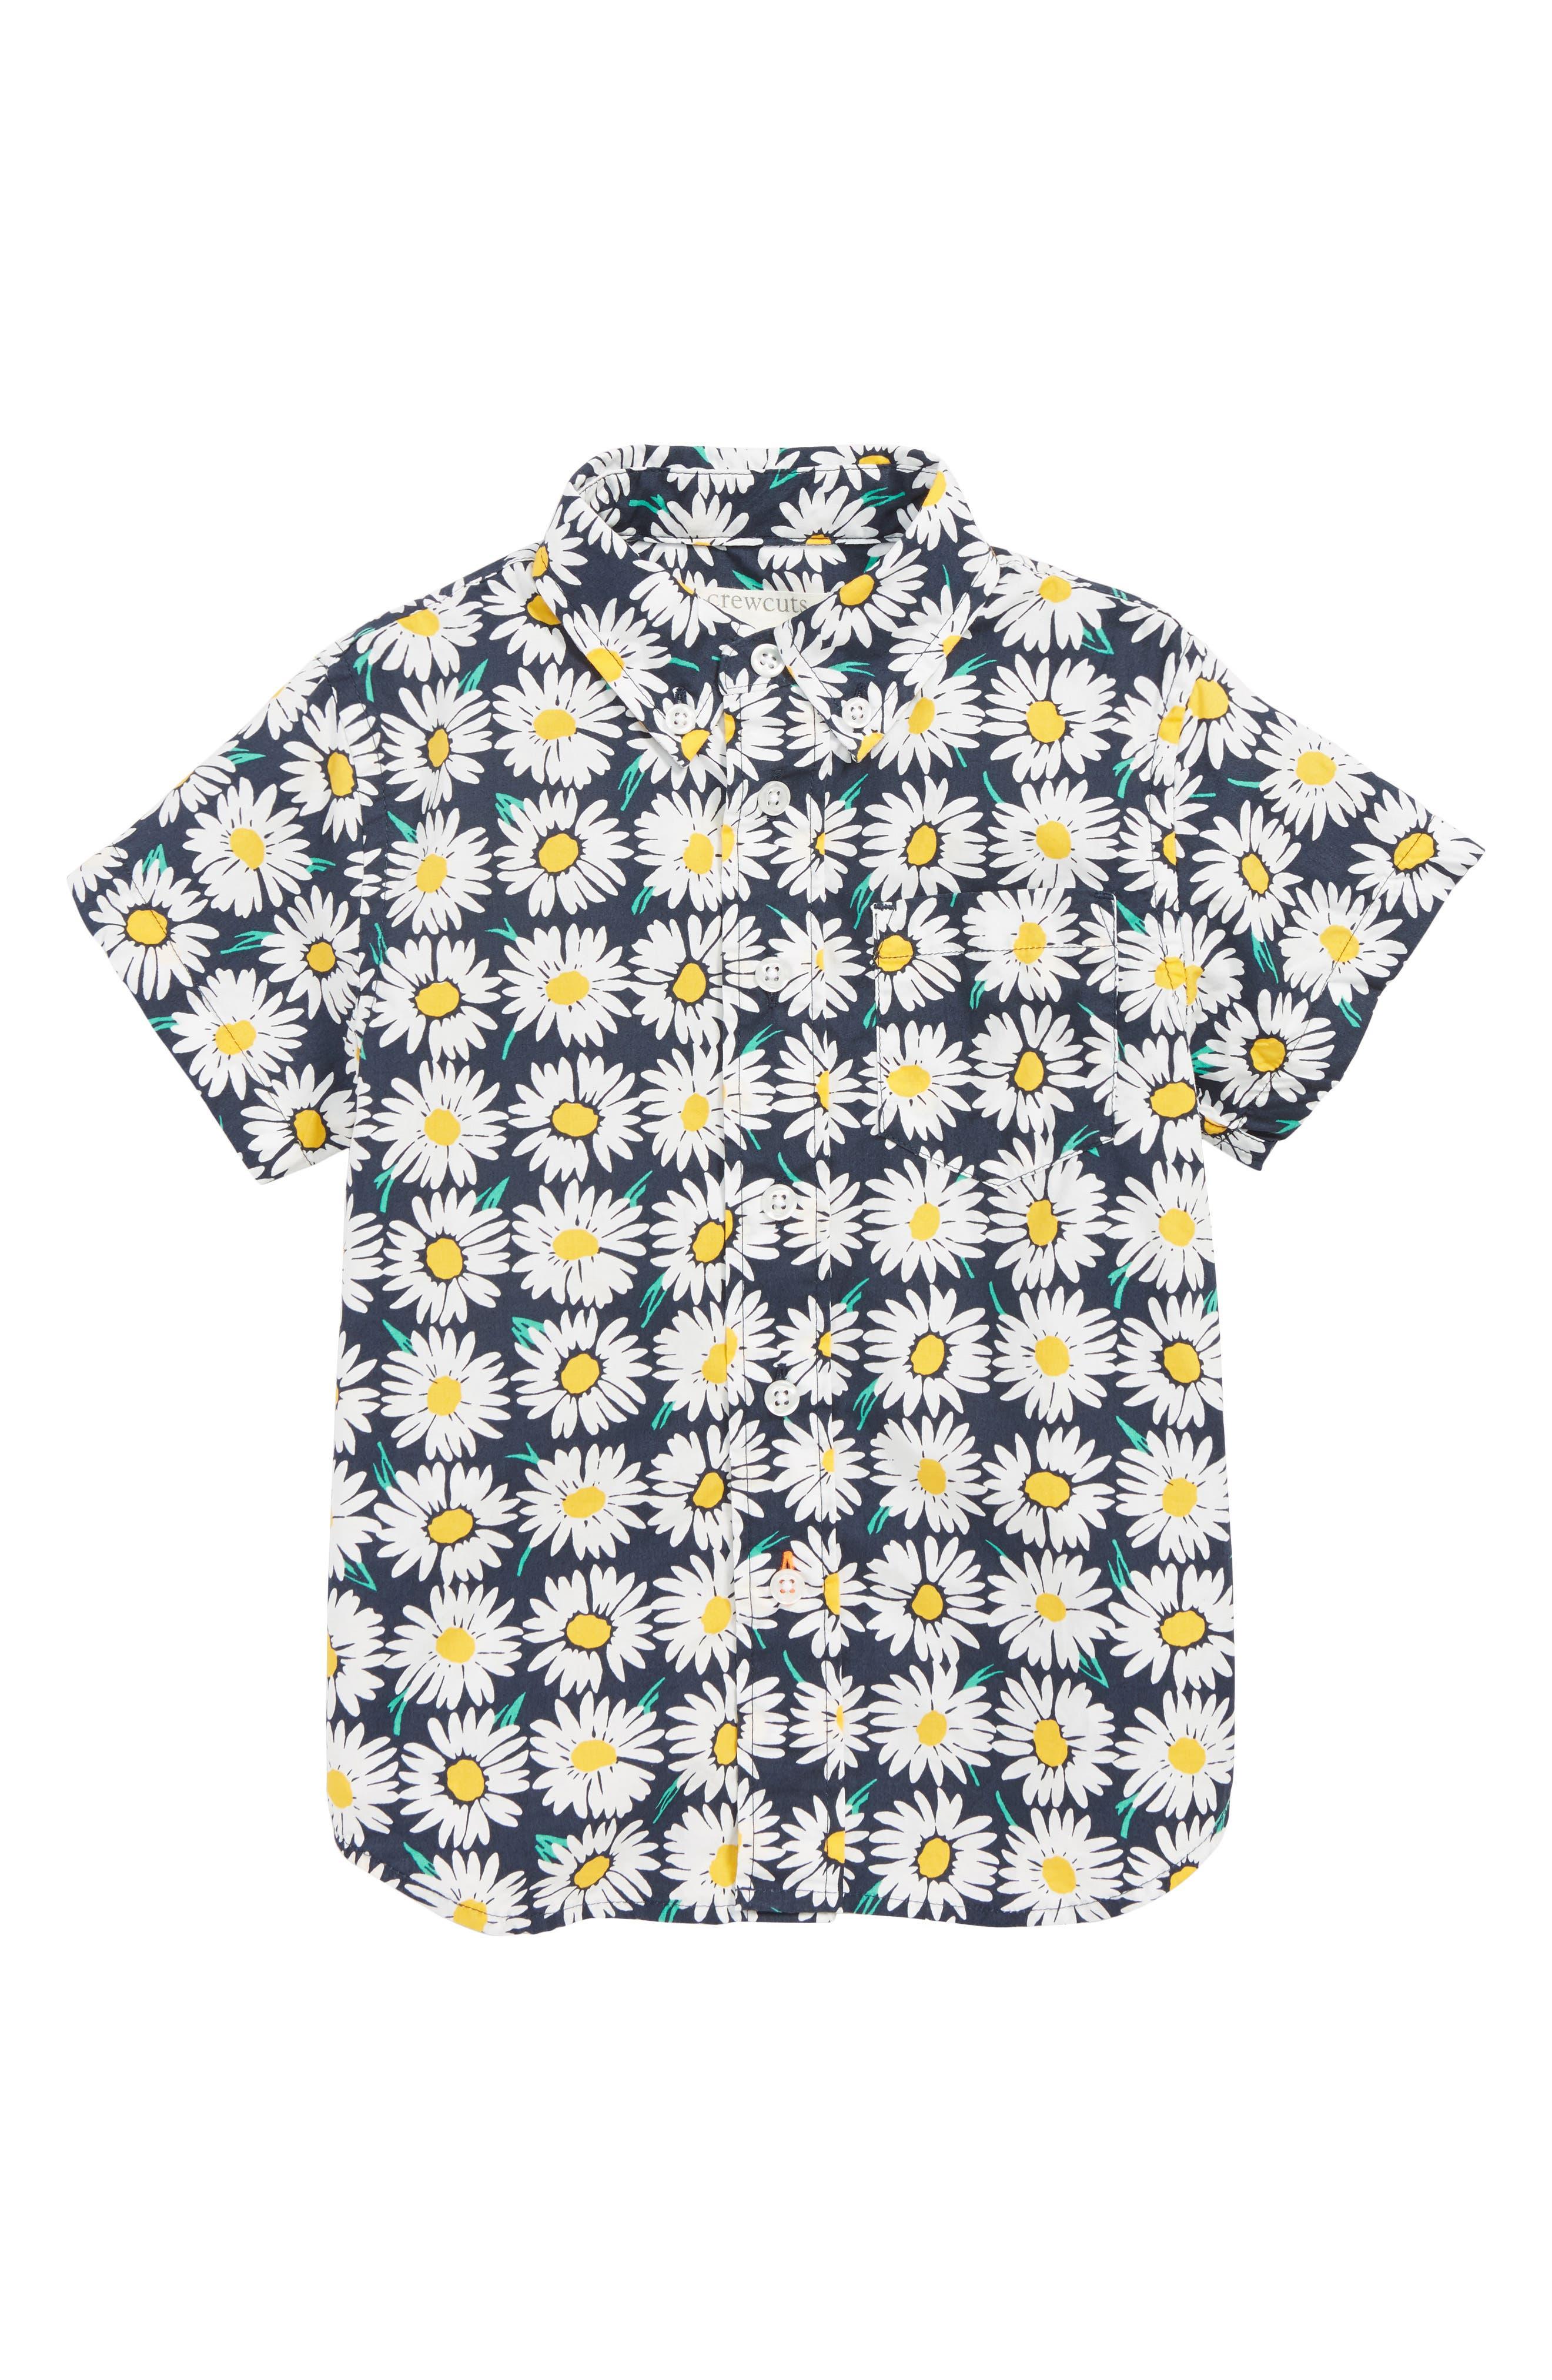 CREWCUTS BY J.CREW,                             Stretch Poplin Button Down Shirt,                             Main thumbnail 1, color,                             CHECKERBOARD DAISY